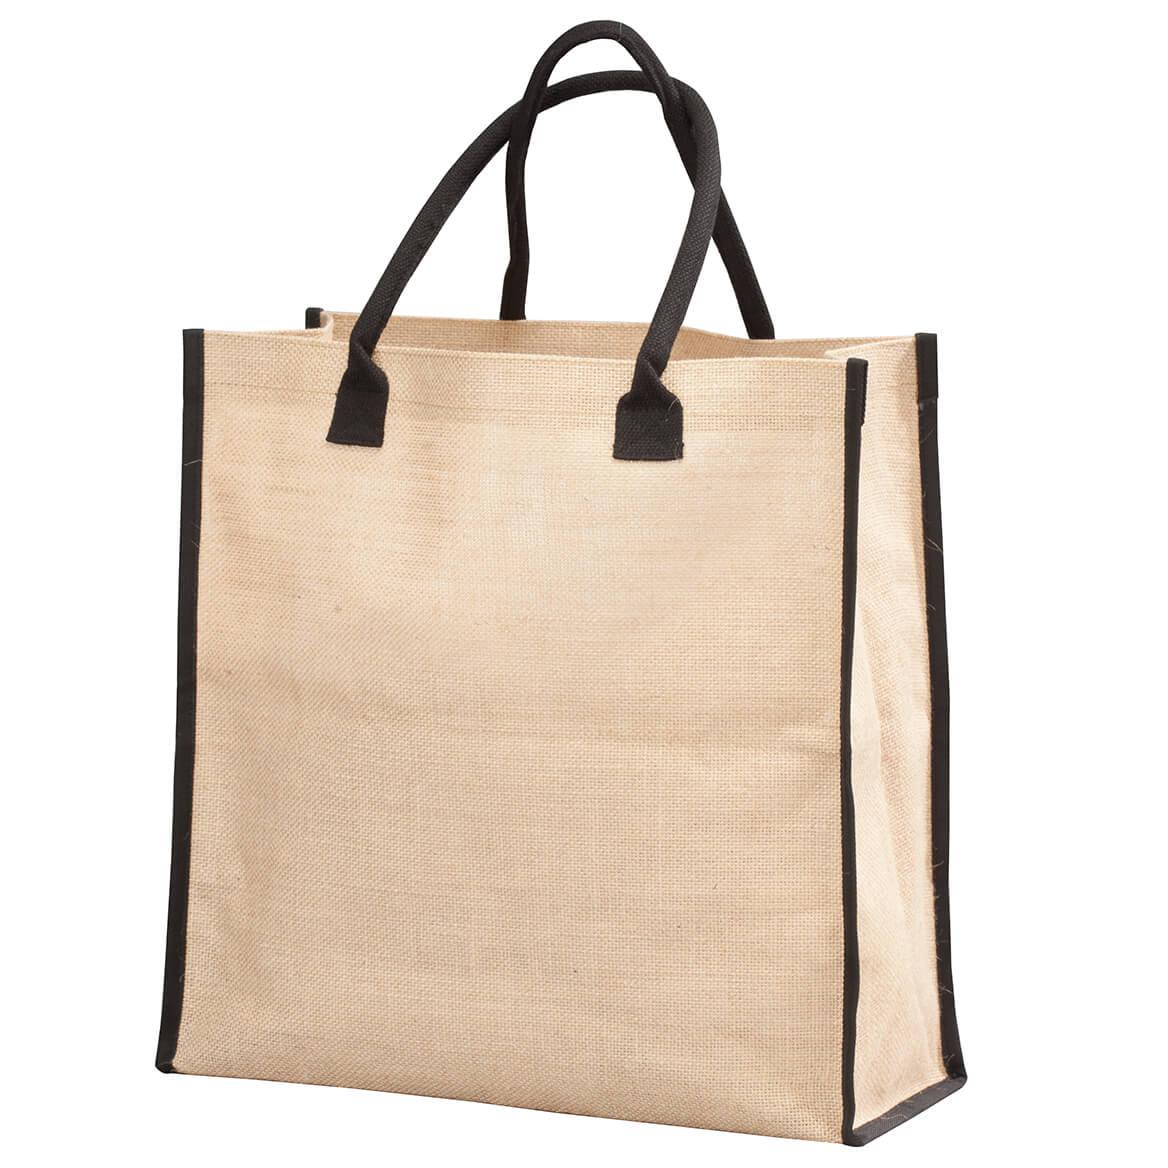 e3b815514 Burlap Tote - Tote Handbags - Womens Totes - Miles Kimball